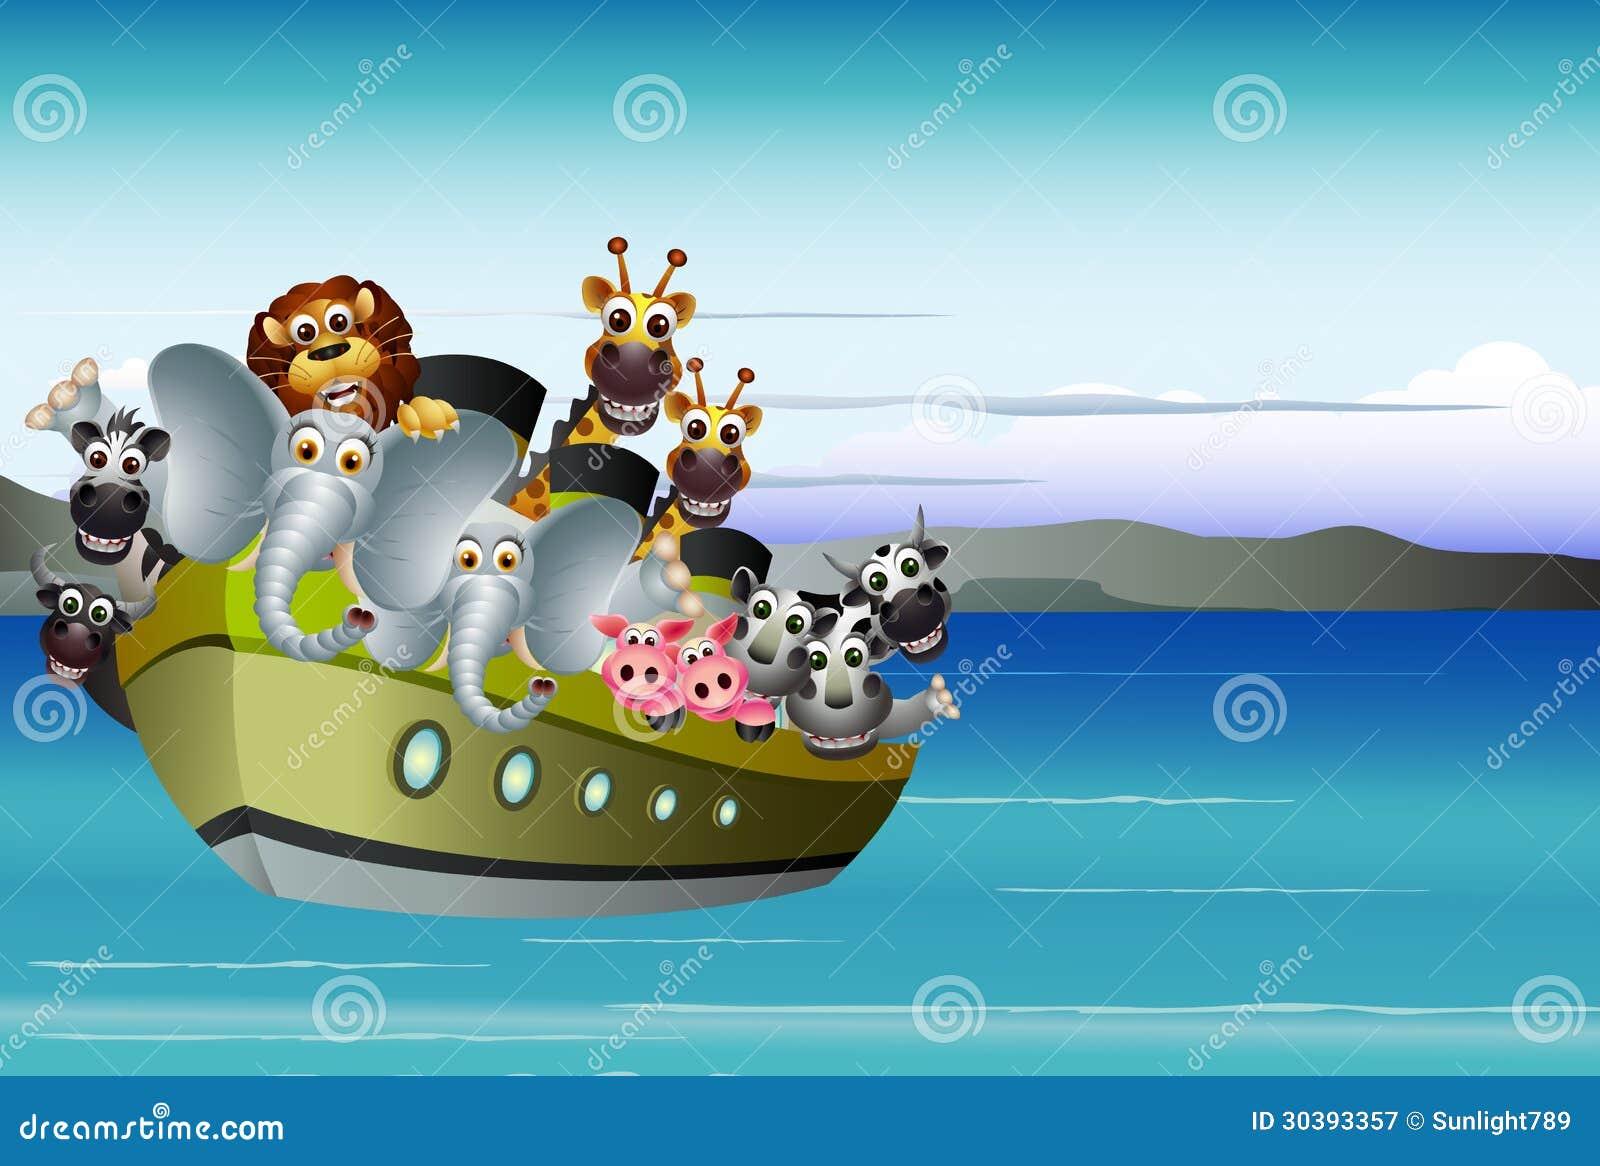 funny animal cartoon on big steamship royalty free stock